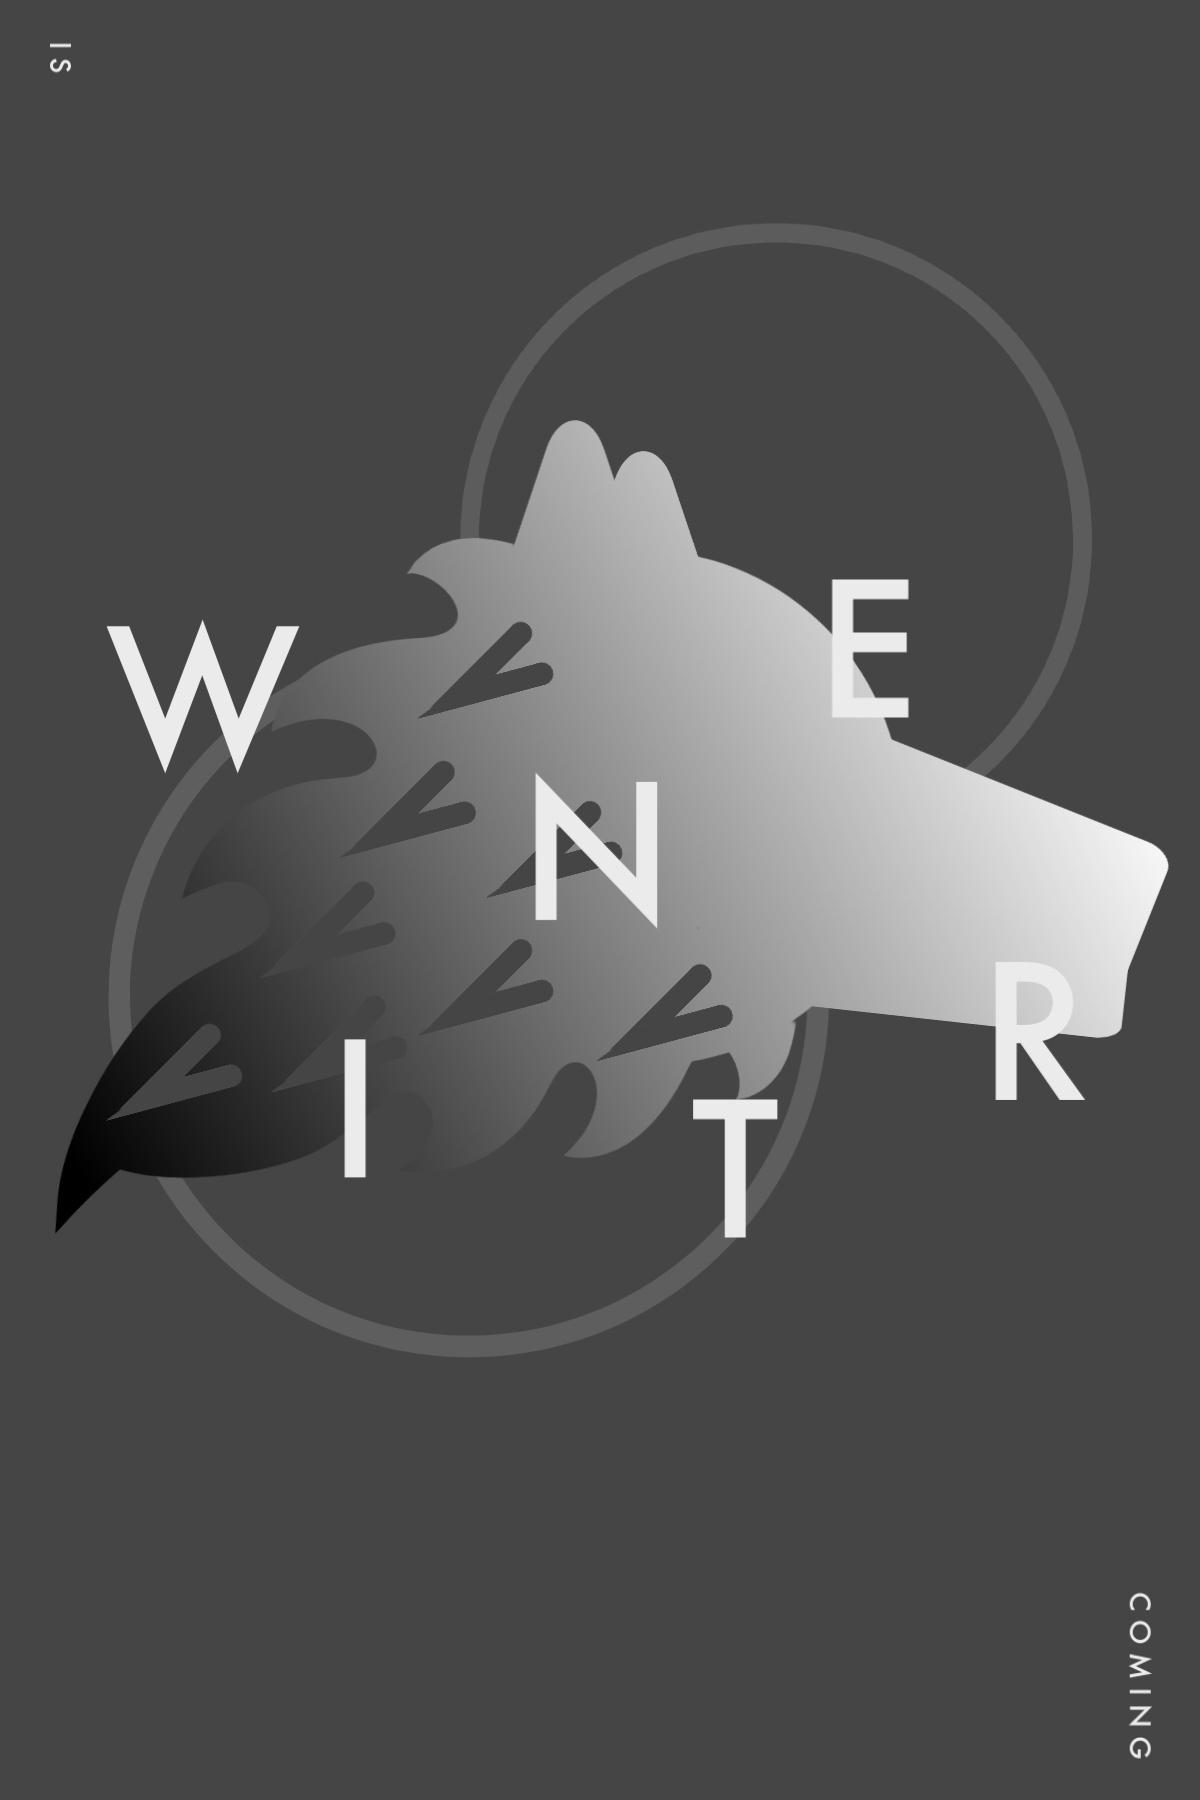 Game of Thrones - monochromatic copy 2.jpg